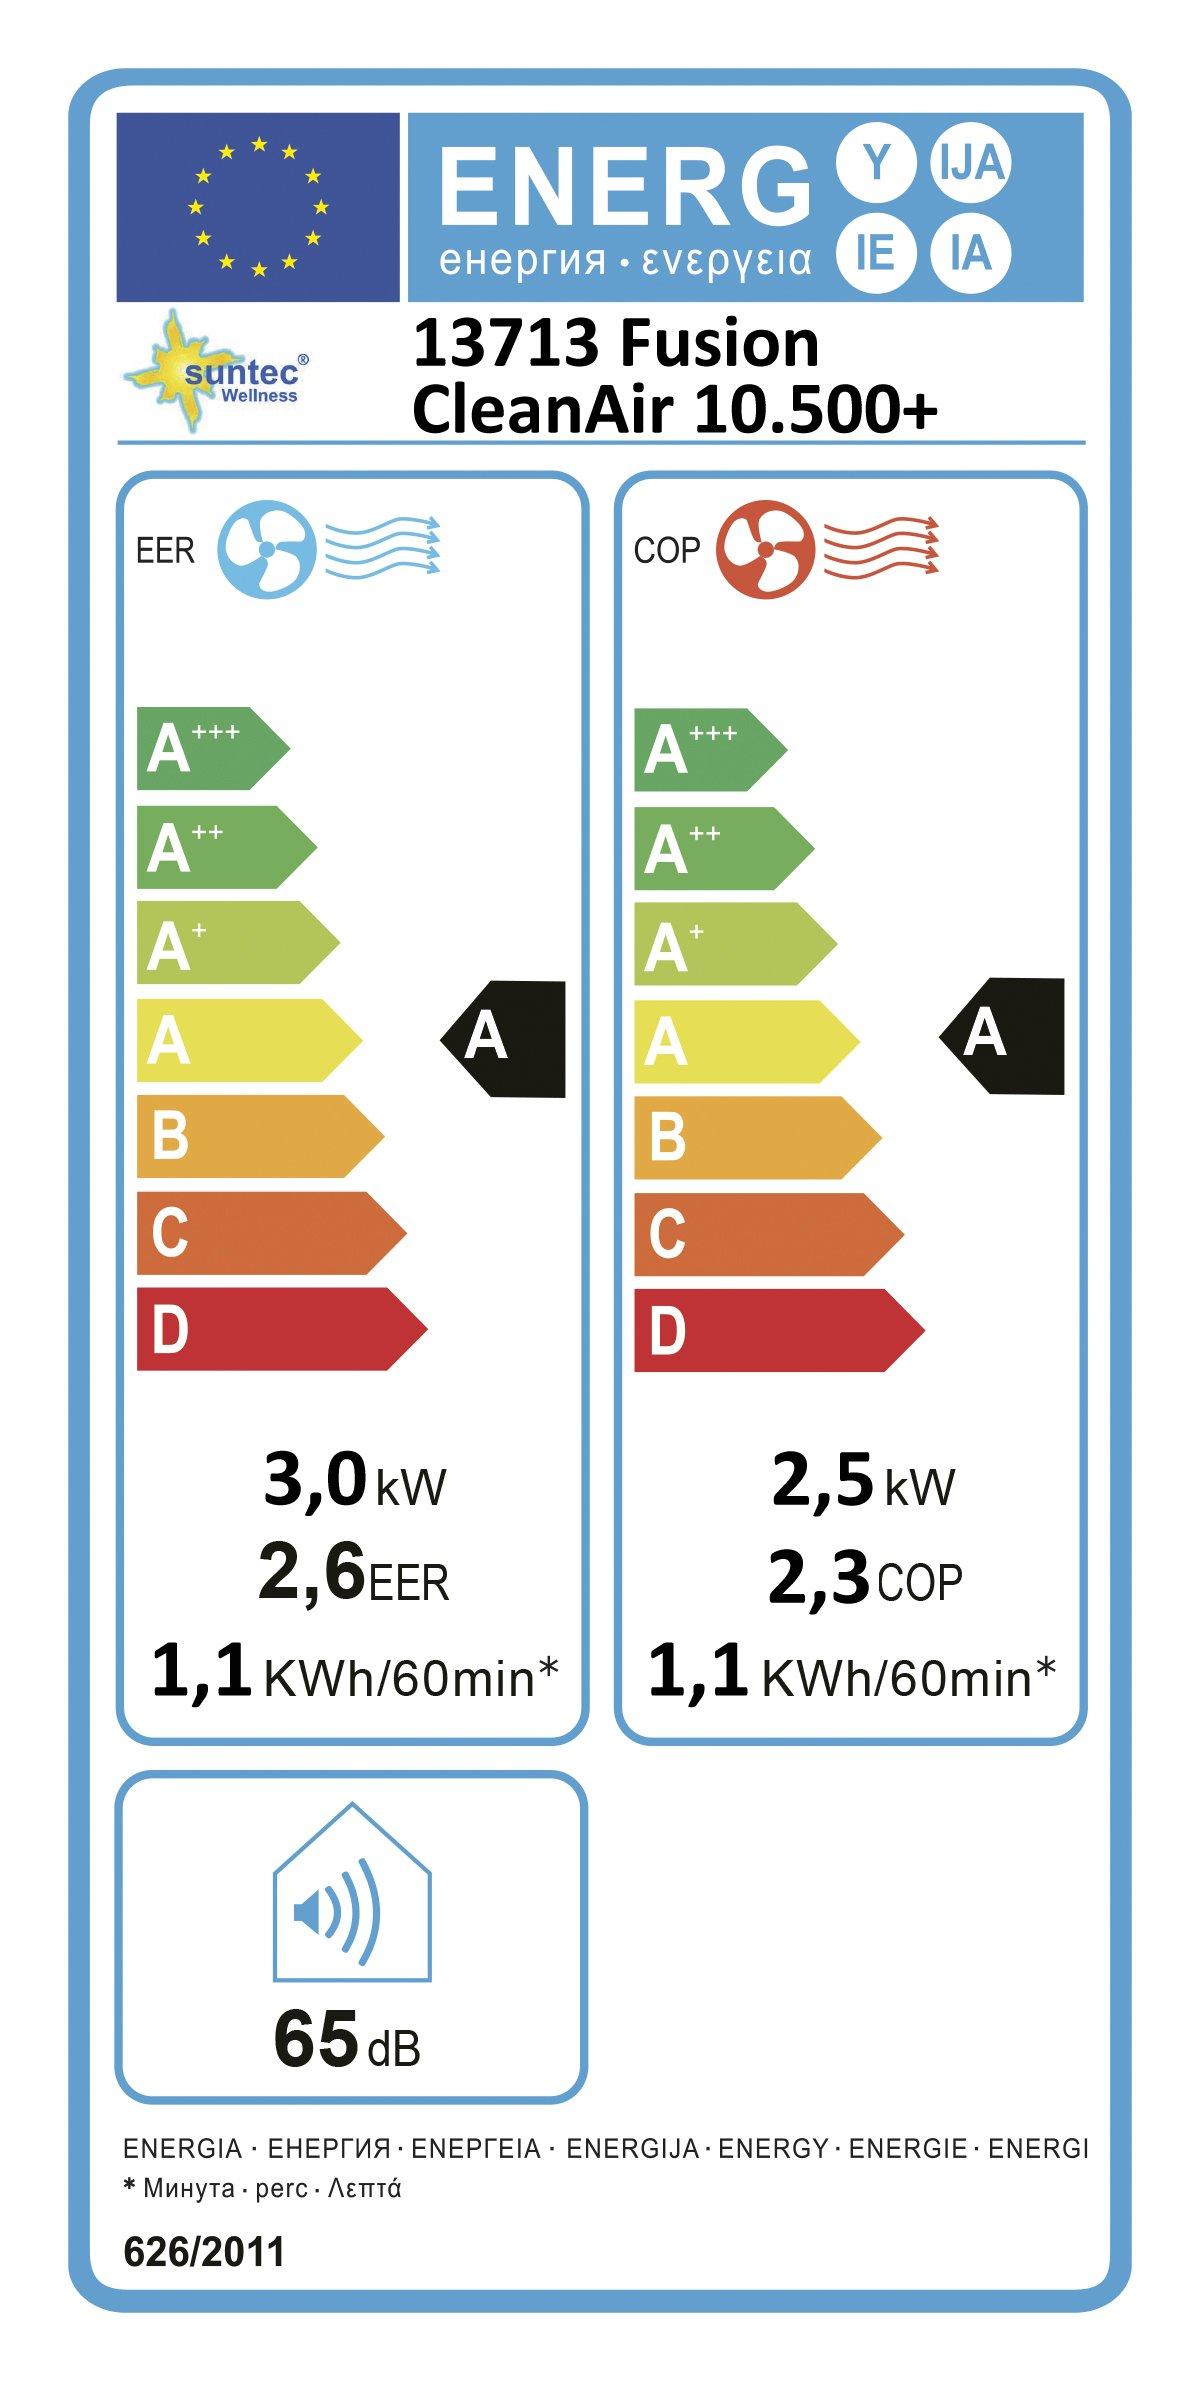 Suntec Wellness mobiles lokales Klimagerät Fusion CleanAir